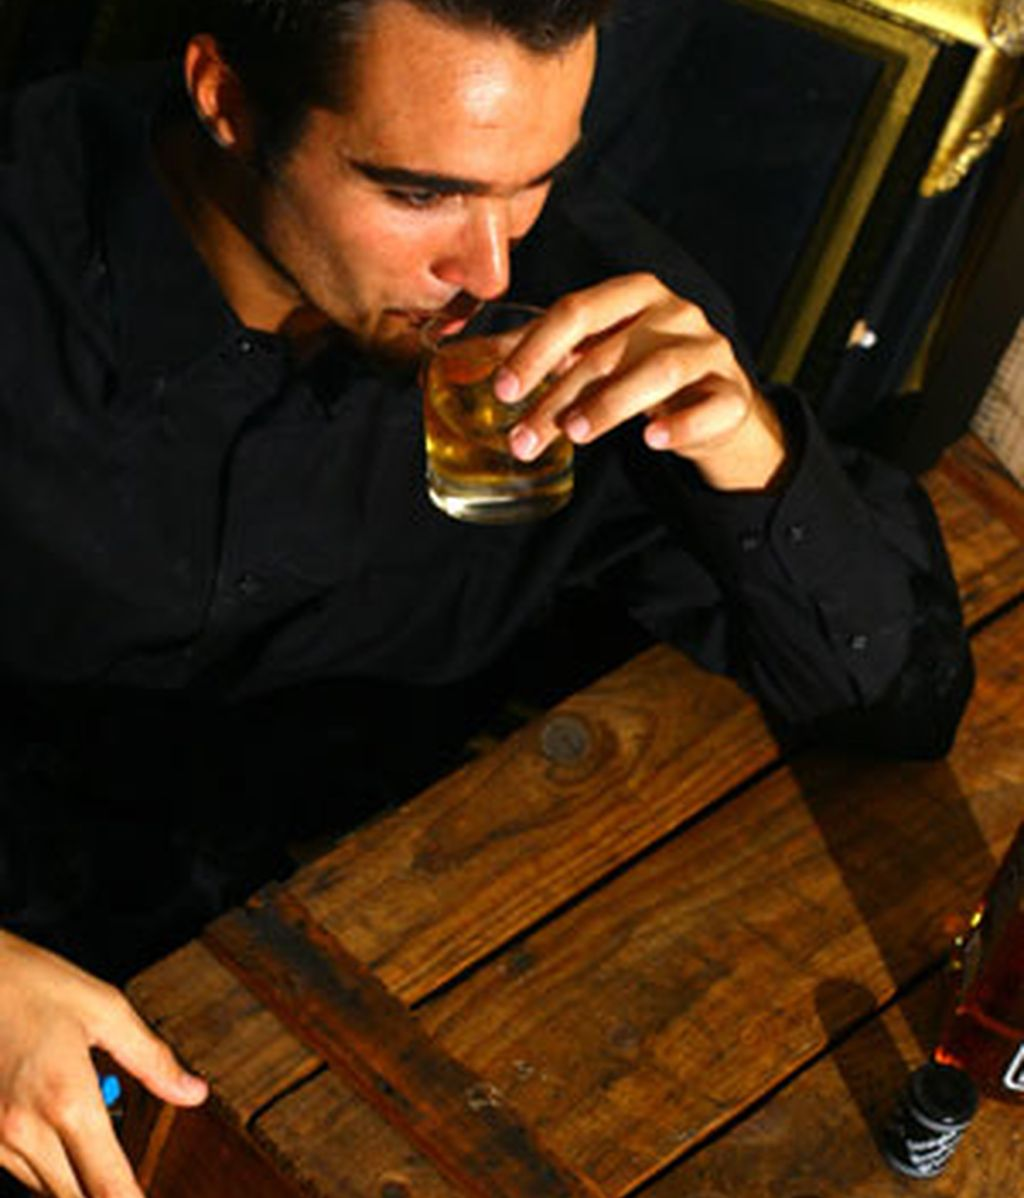 Embajador del Whisky